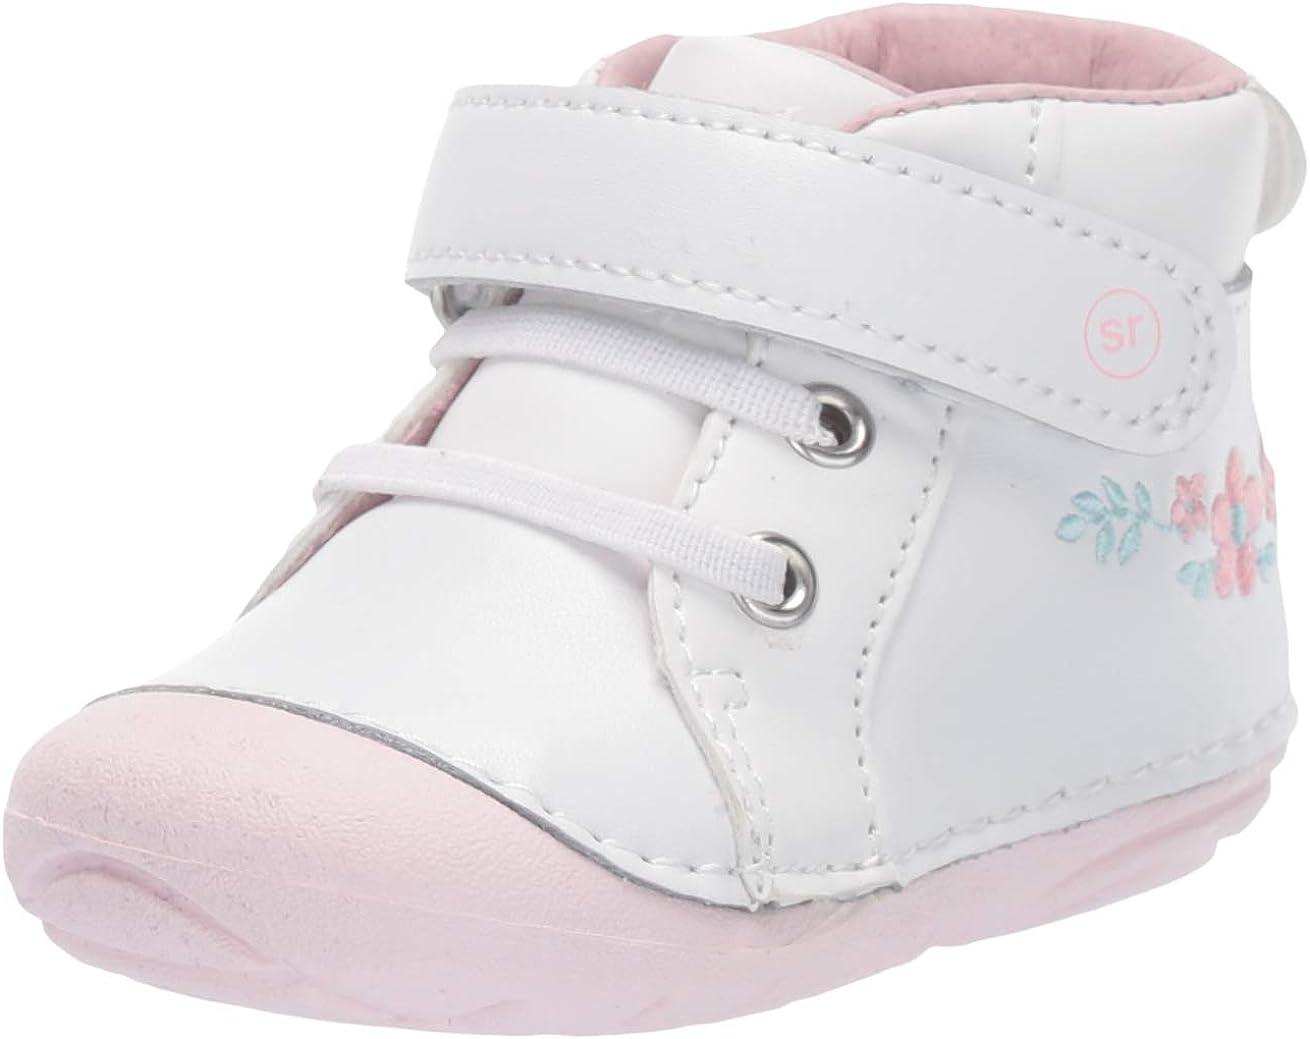 Stride Rite Kids Sm Frankie Sneaker